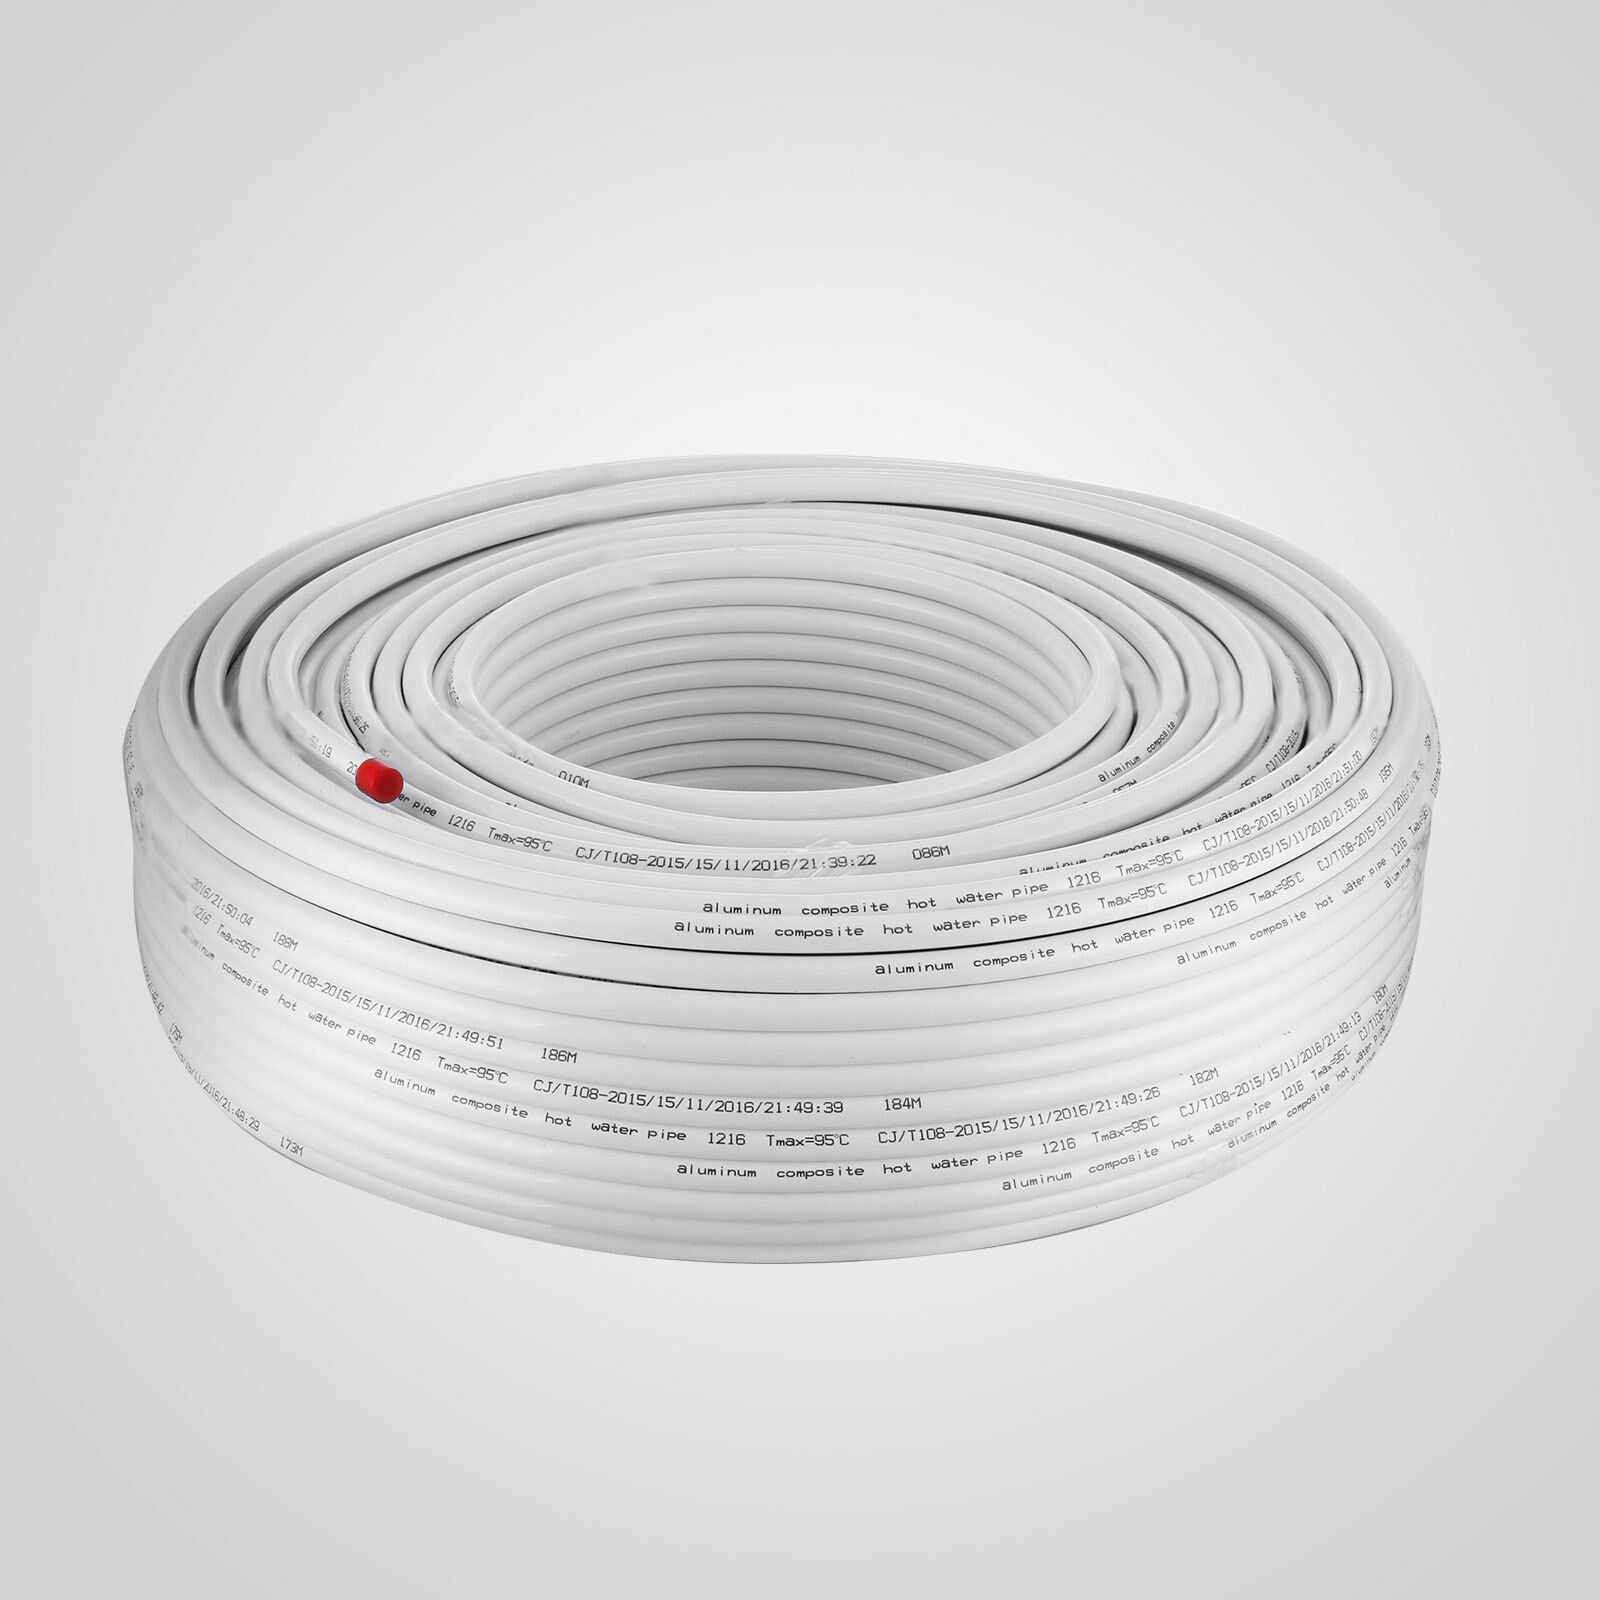 1 2 Pex Tubing Pex Al Pex Radiant Heat Polyethylene Aluminum Layer 200m Top Roll Roll Roll Aliexpress